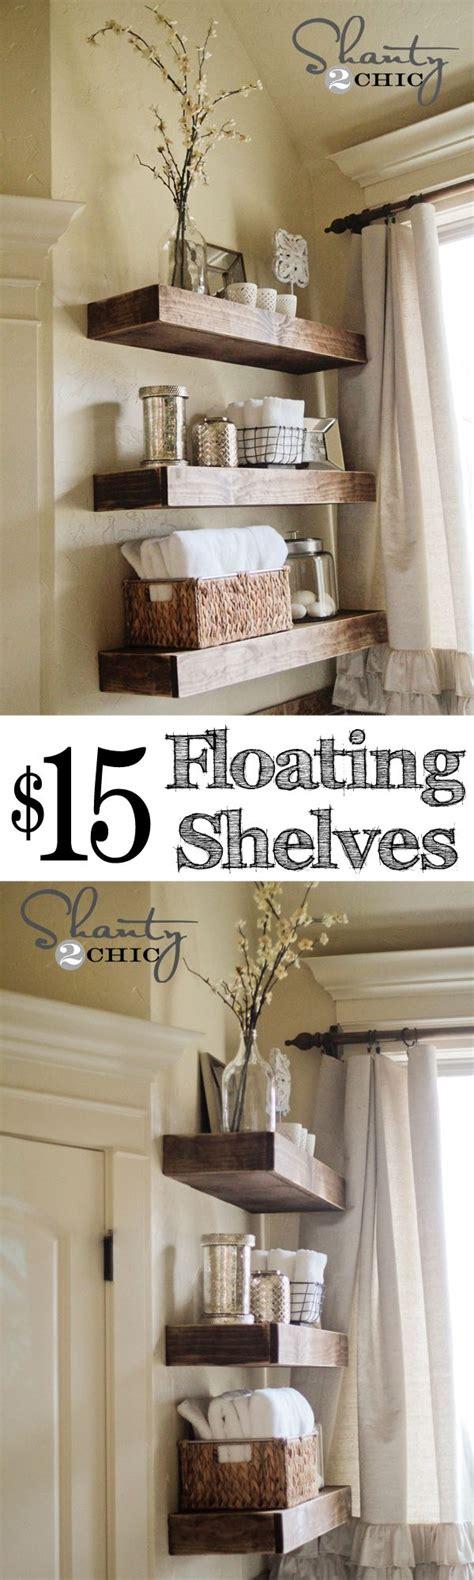 cheap bathroom shelves 17 best images about diy rustic decorations on pinterest